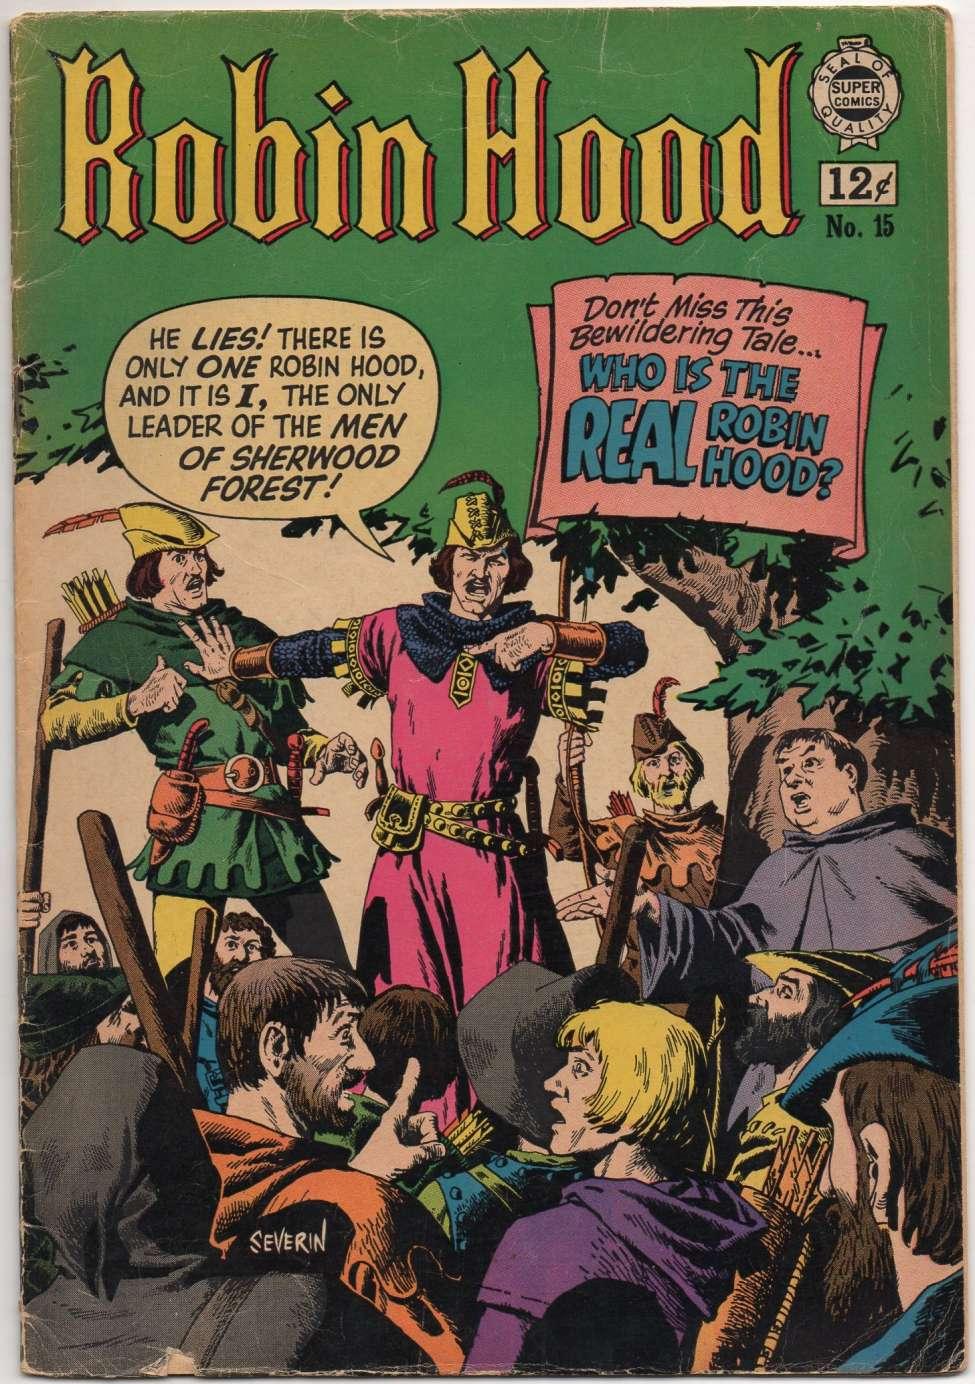 Comic Book Cover For Robin Hood #15